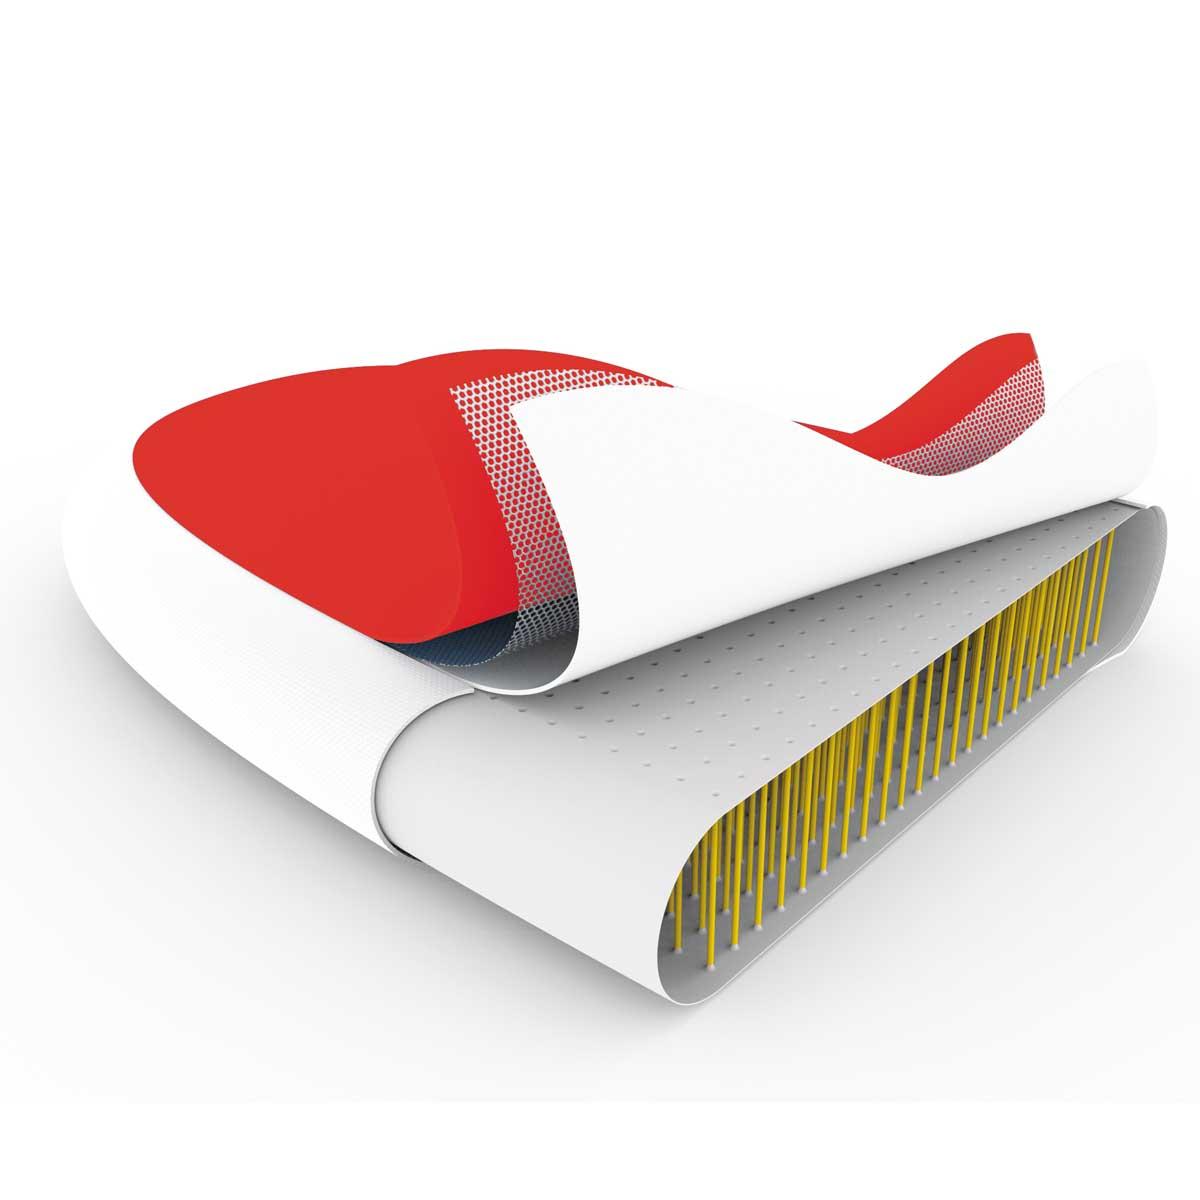 Hydro-Force Aqua Journey Inflatable SUP 9ft